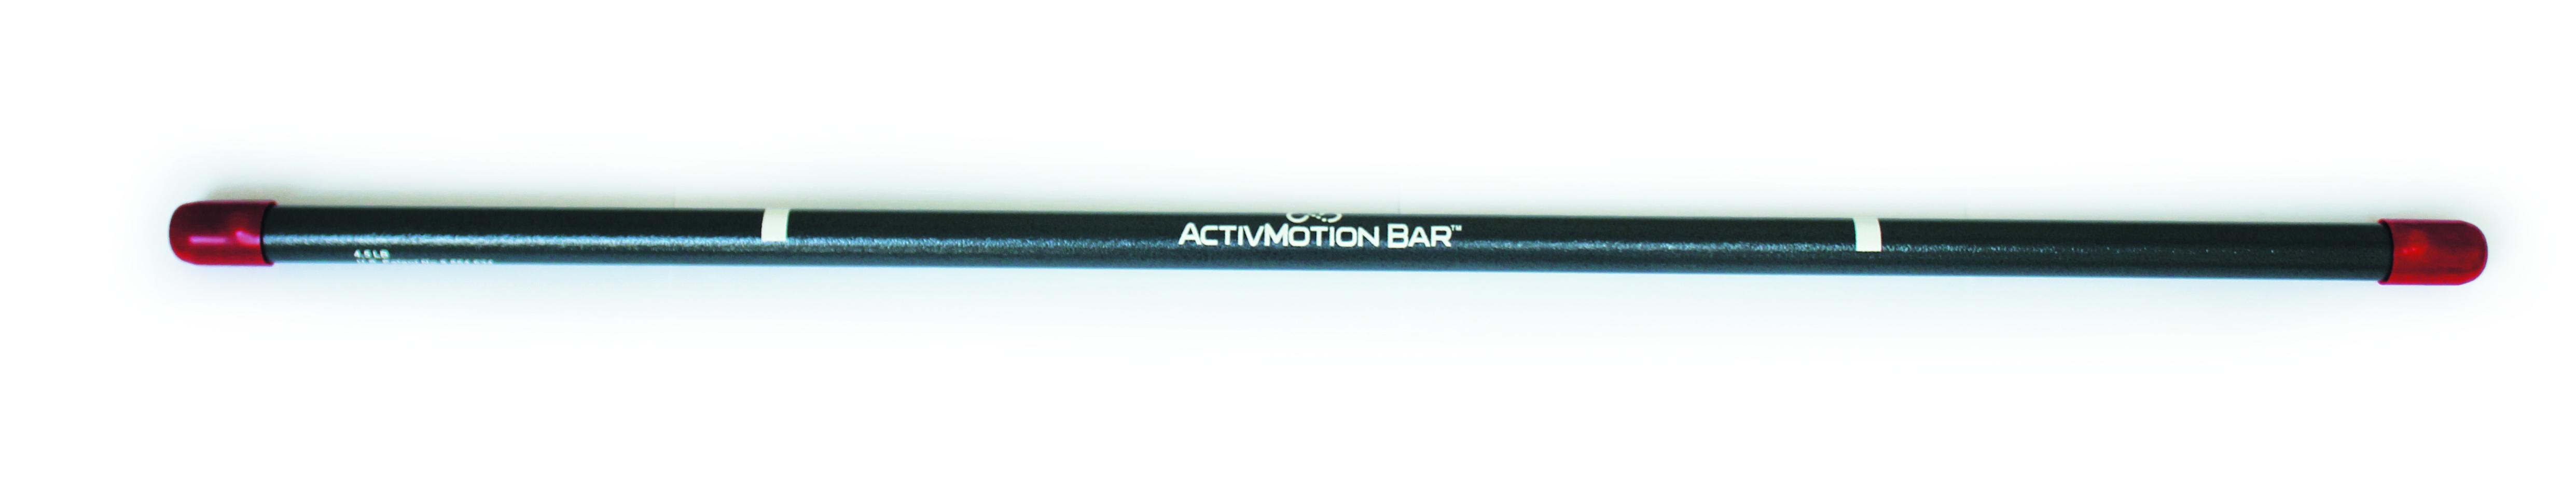 Activmotionbar